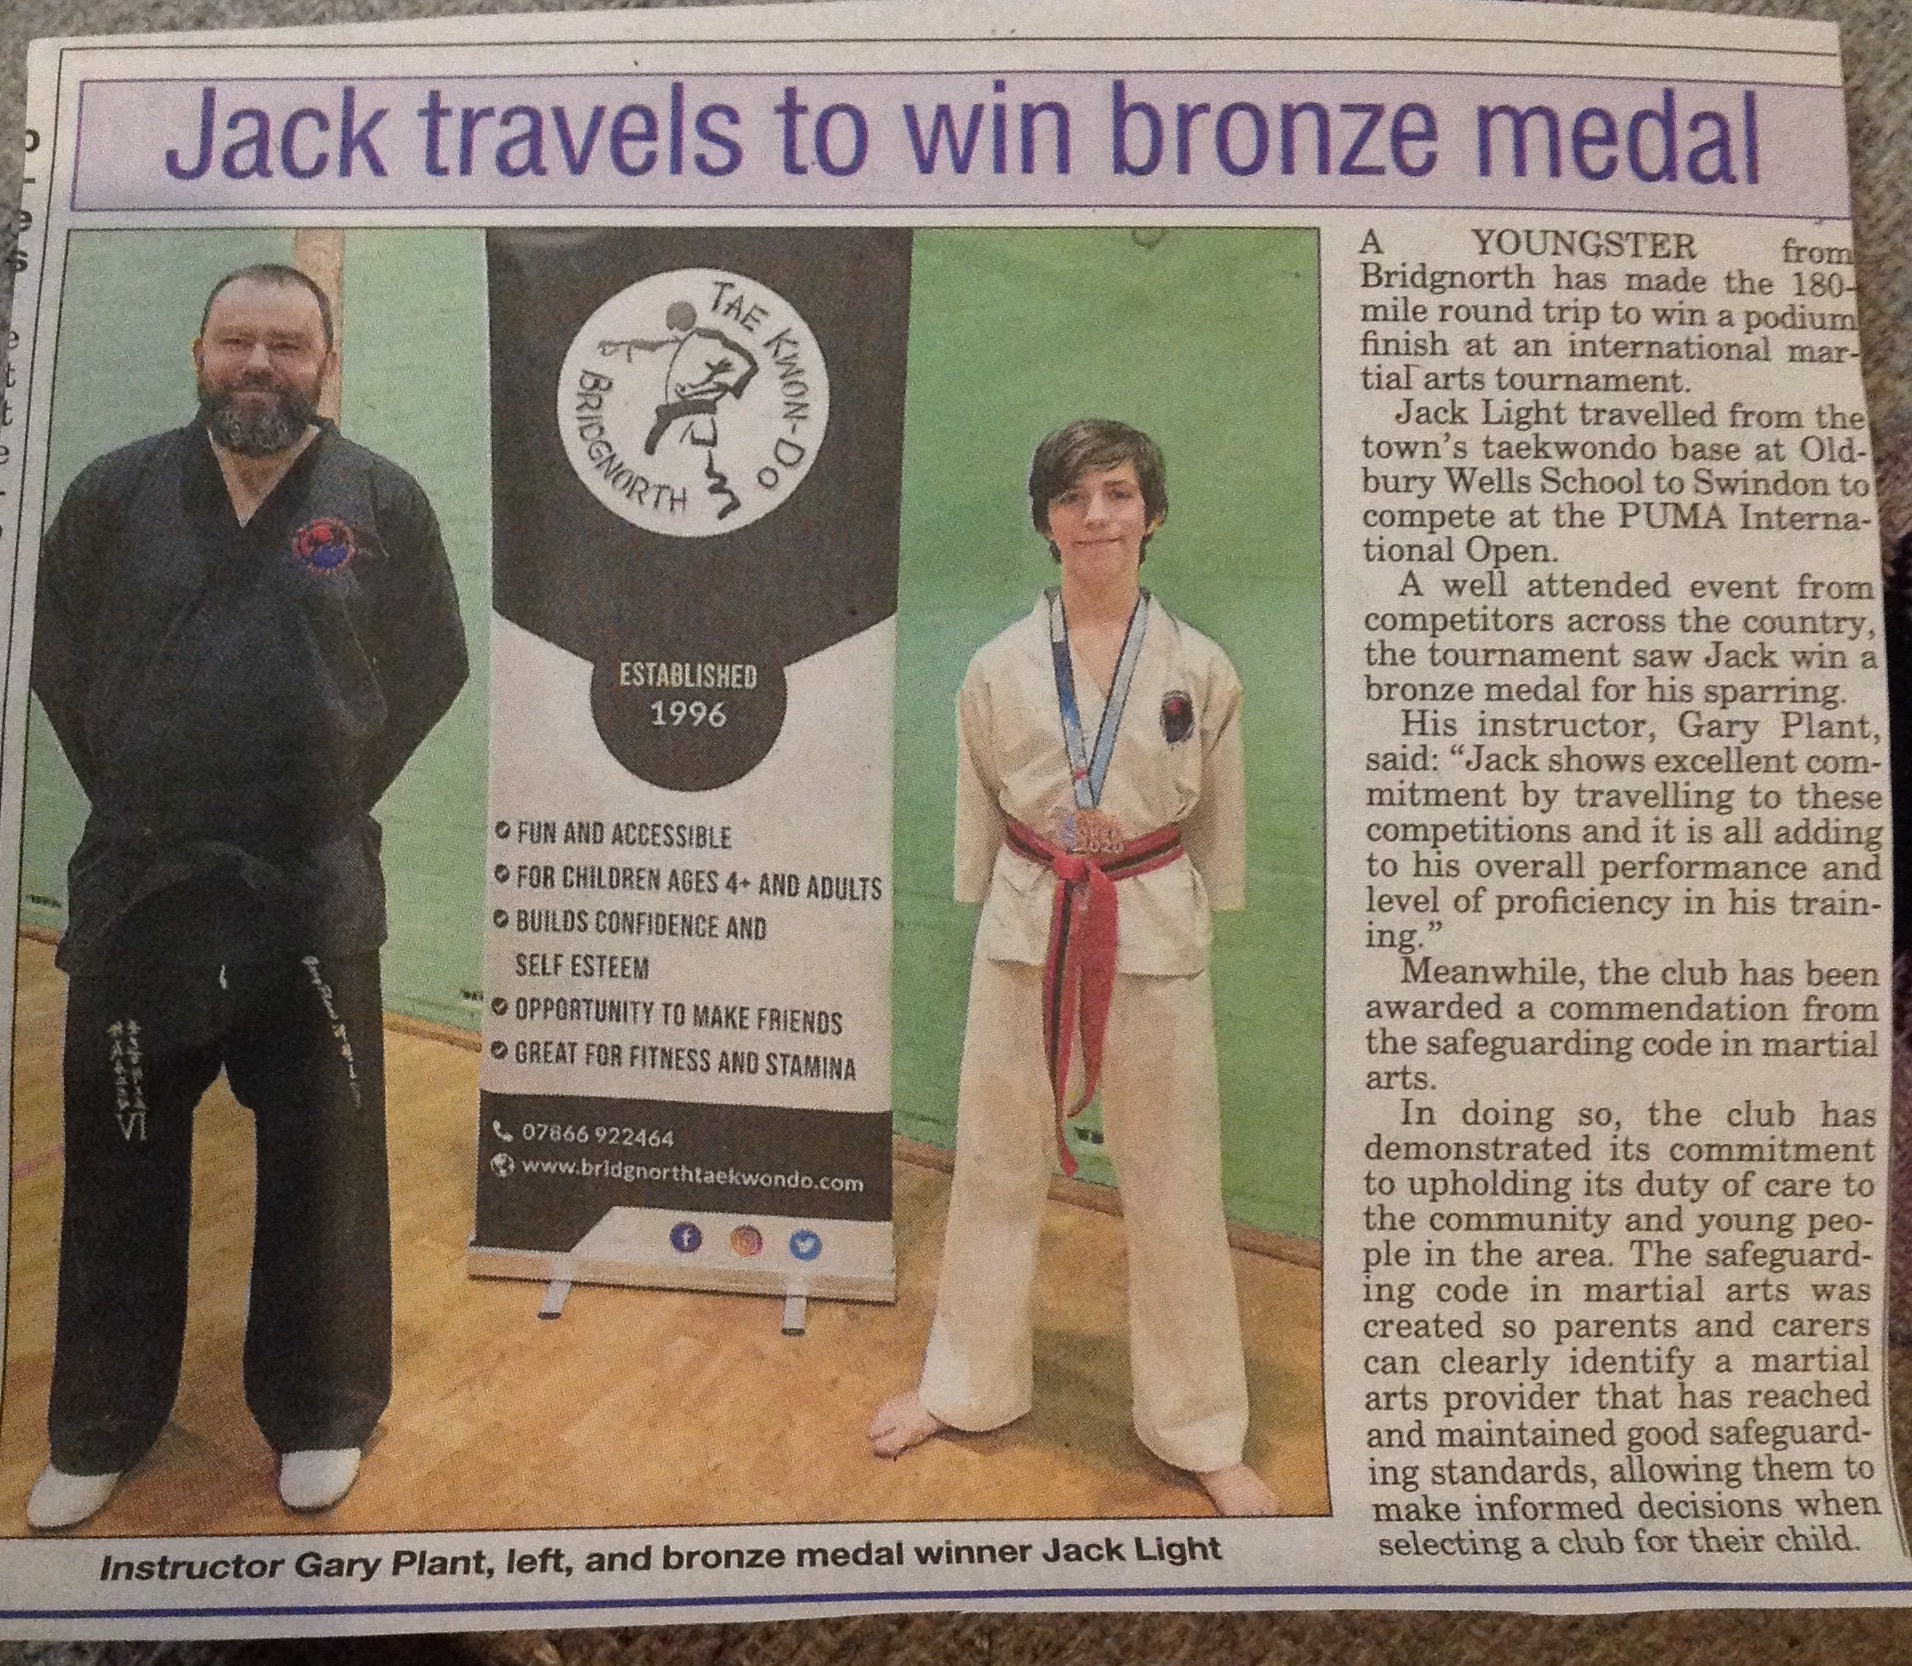 Bridgnorth Journal for Bridgnorth TKD's medal success and safeguarding code mark